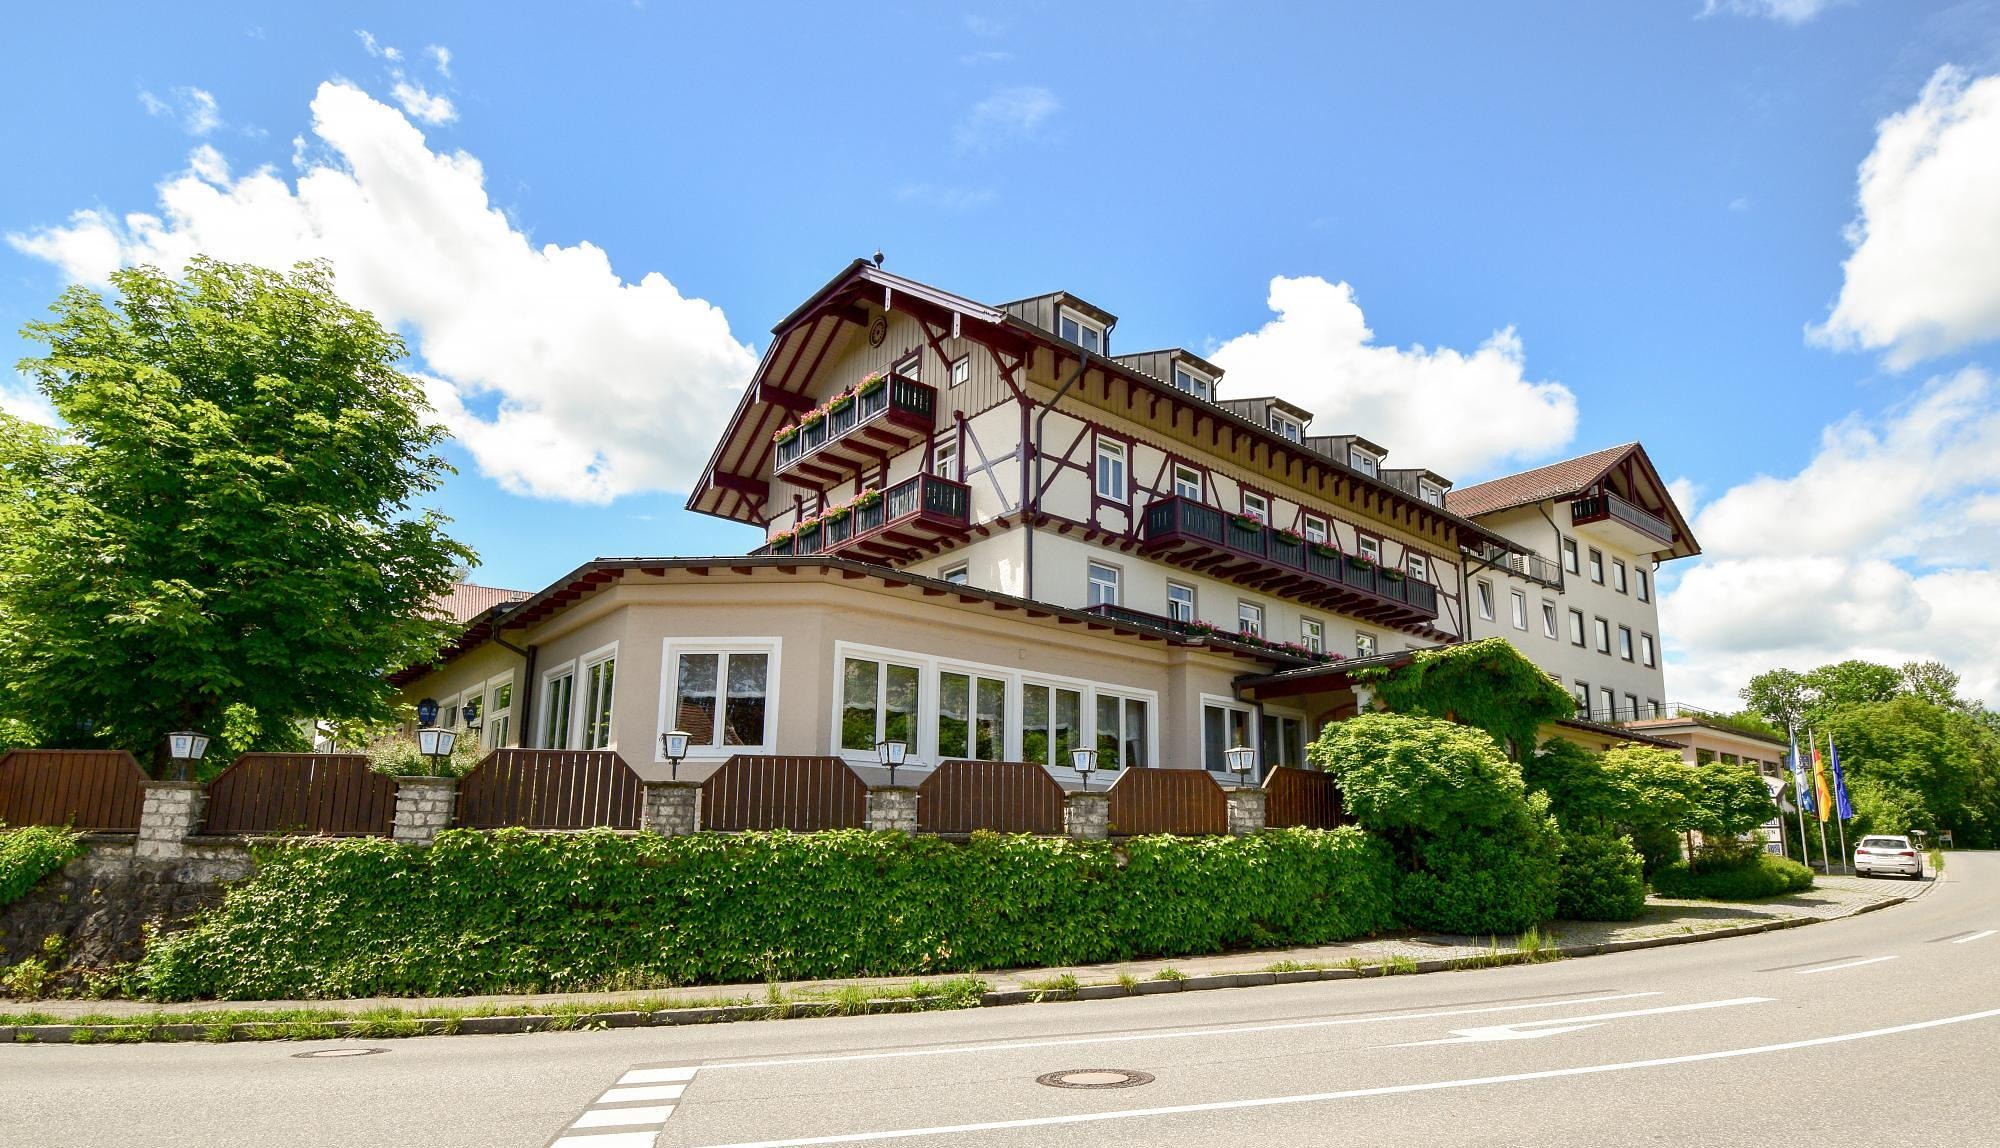 Hotel Seeblick Bernried Am Starnberger See